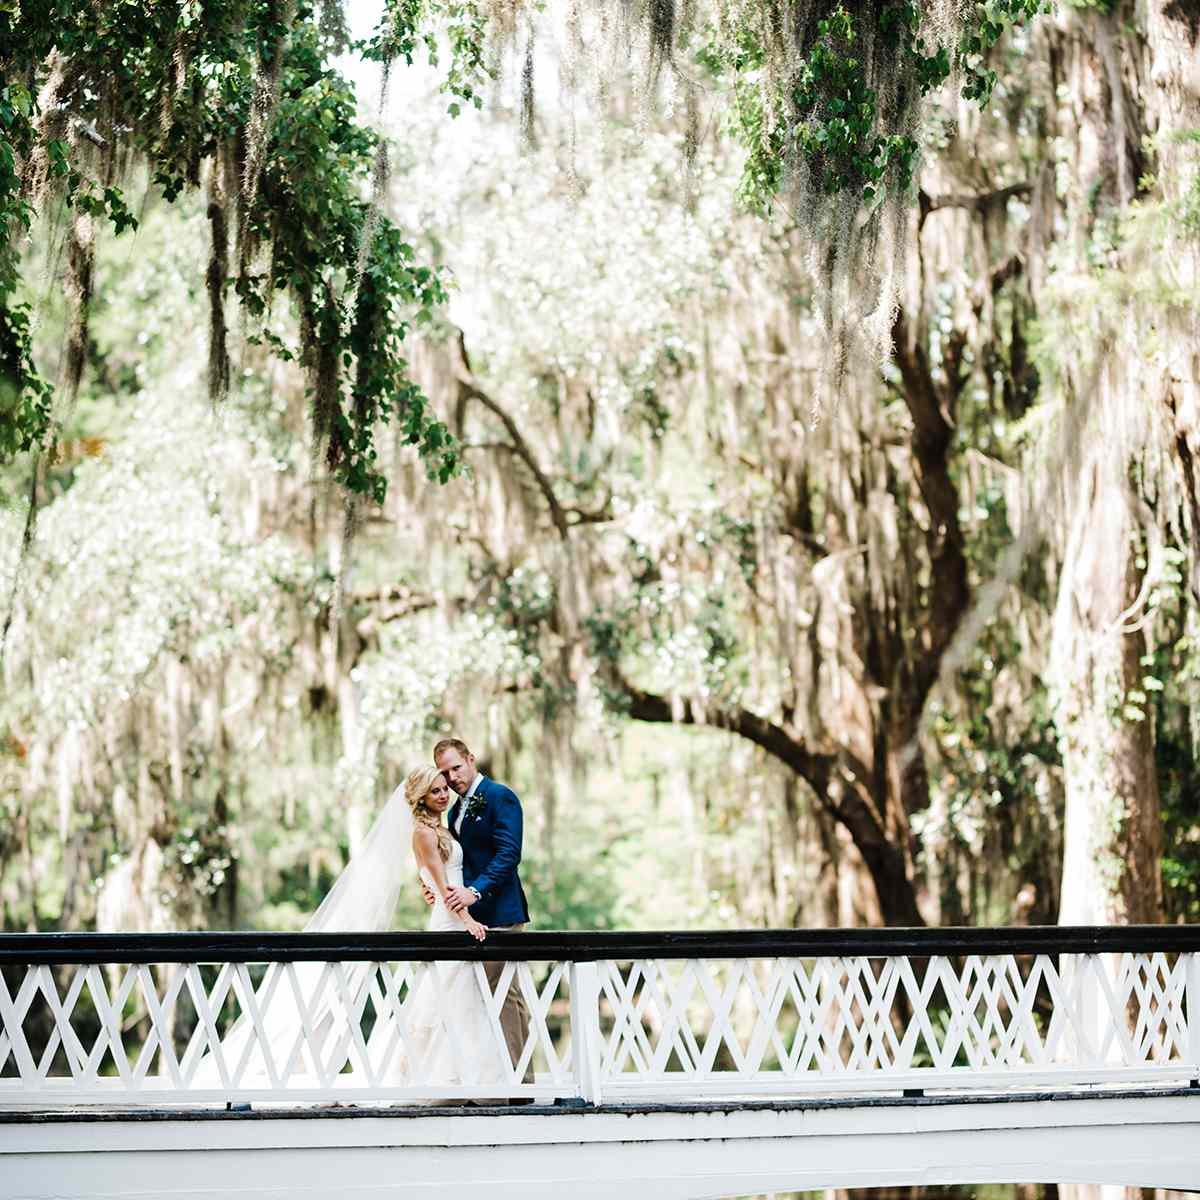 <p>Wedding photo at Magnolia Plantation in South Carolina</p>